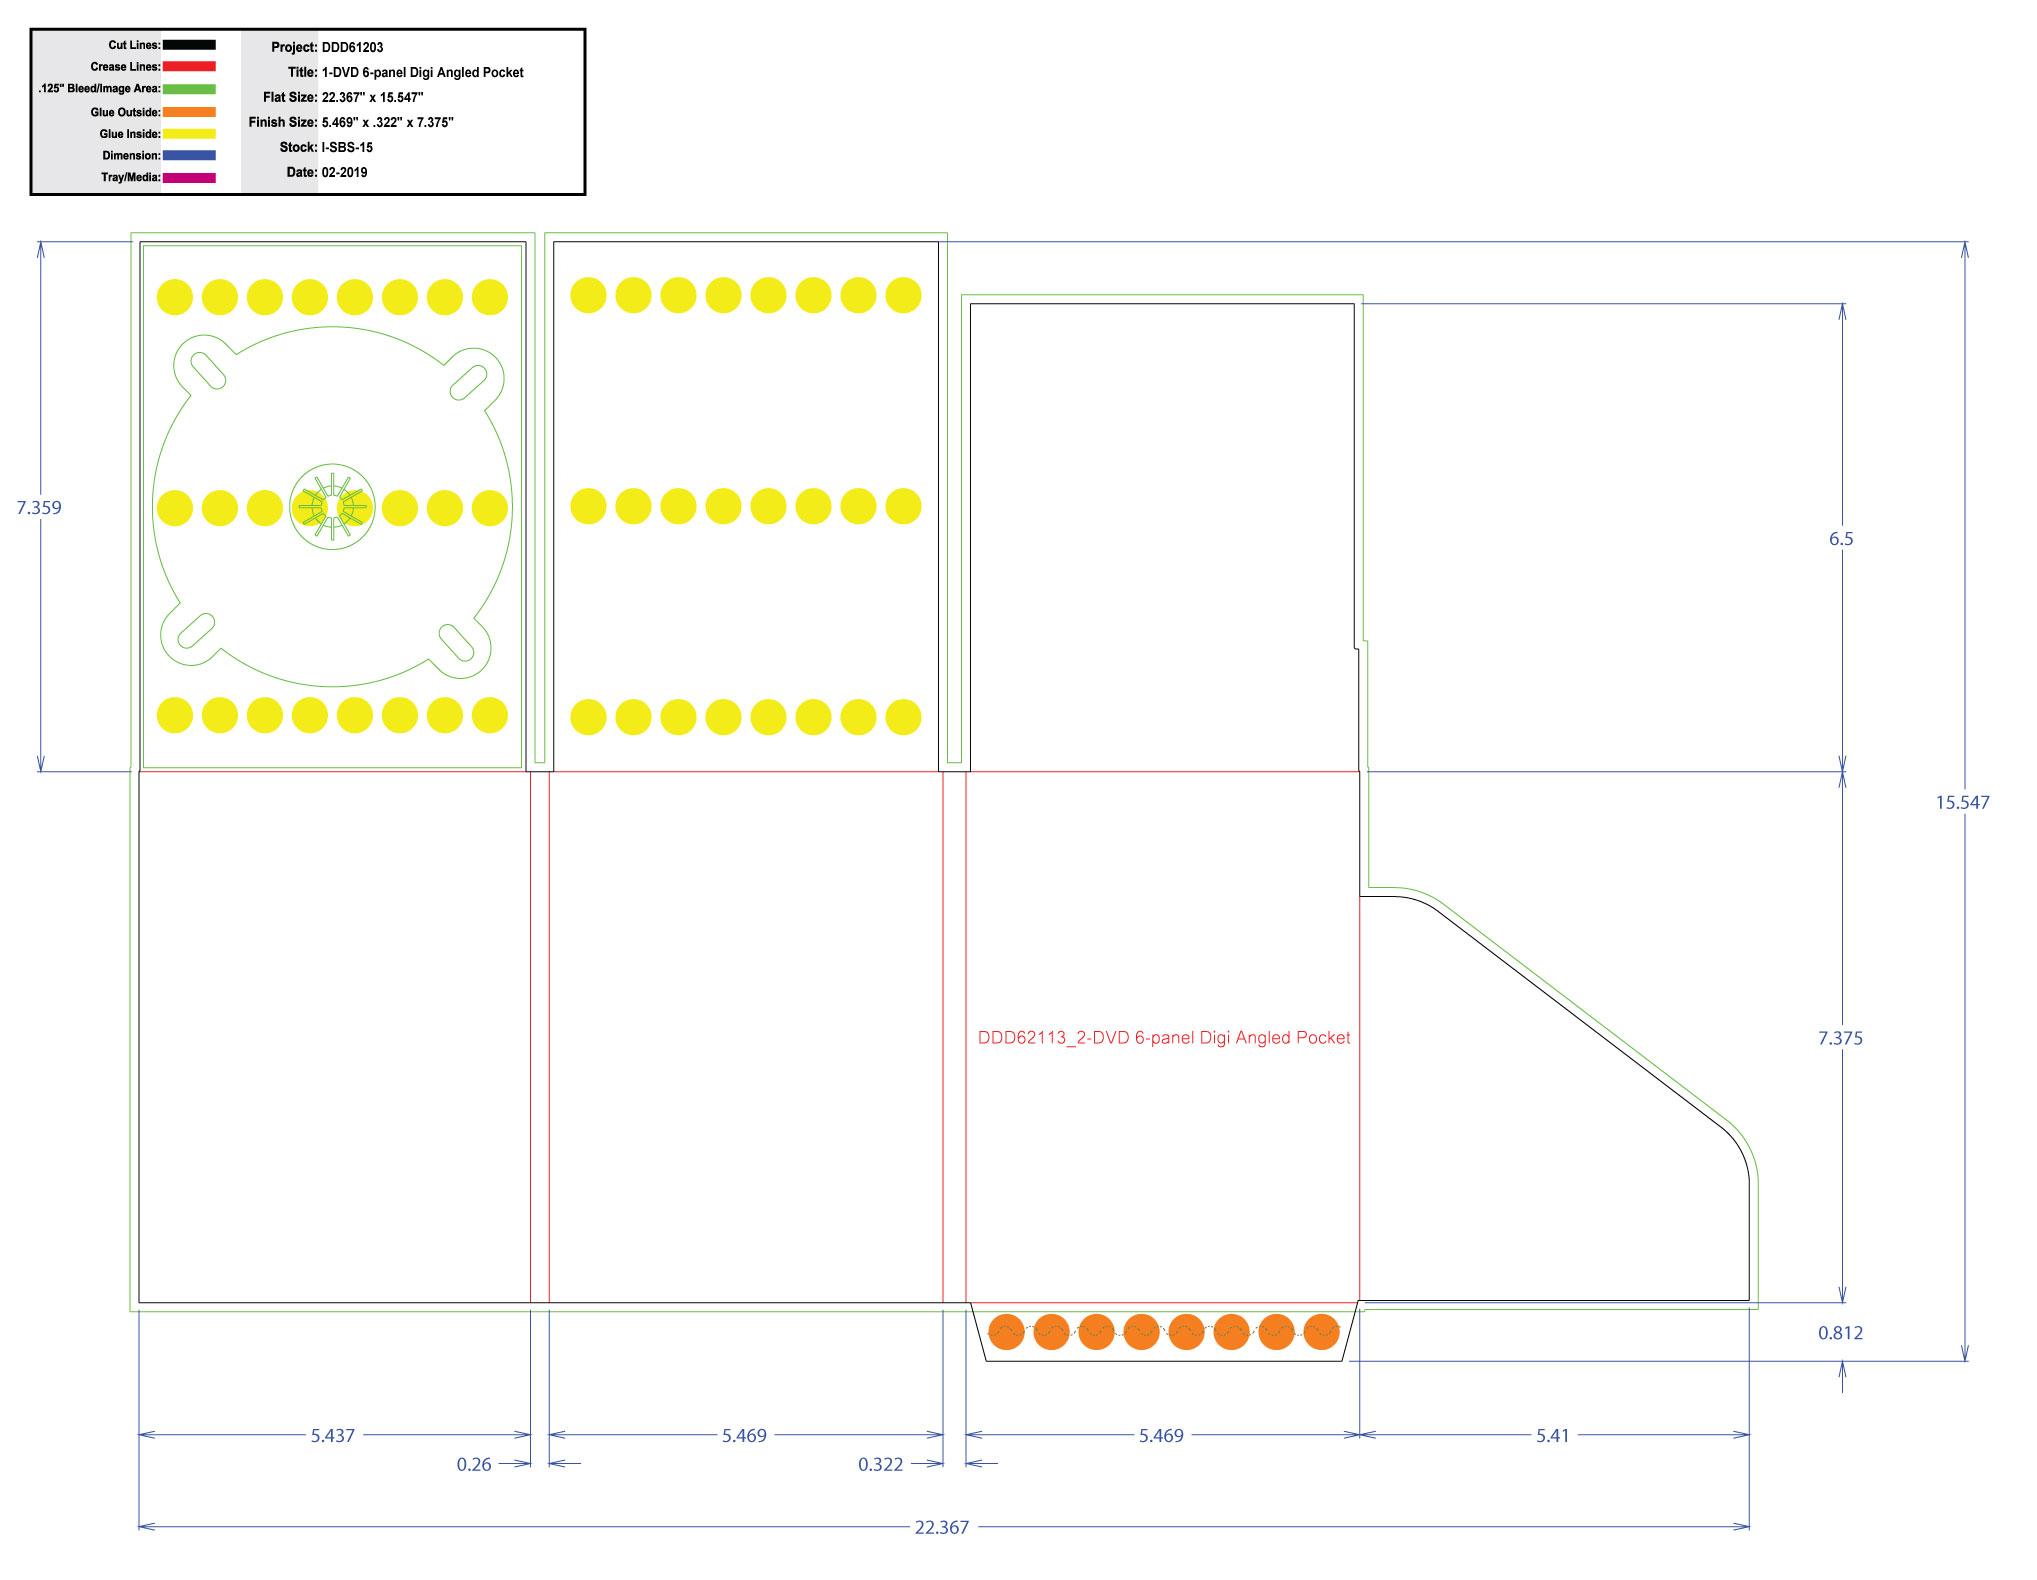 DDD61203 DVD 6 Panel Digi 1 Tray, Angled Pocket